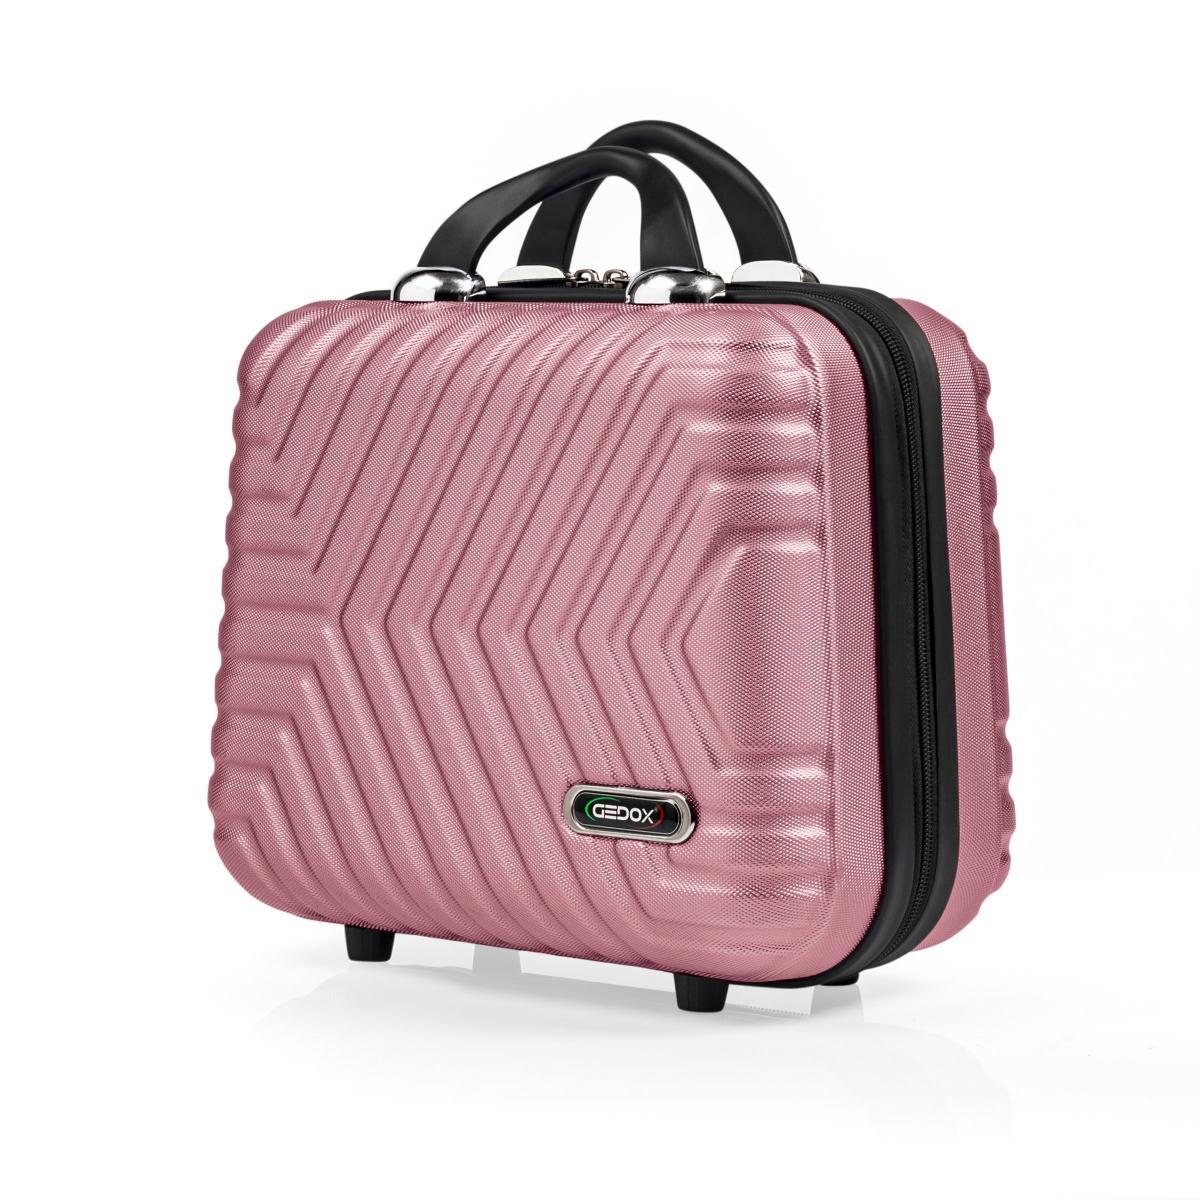 G&D Polo Suitcase Abs Makyaj&Hostes El Çantası Model:615.08 Gül Kurusu